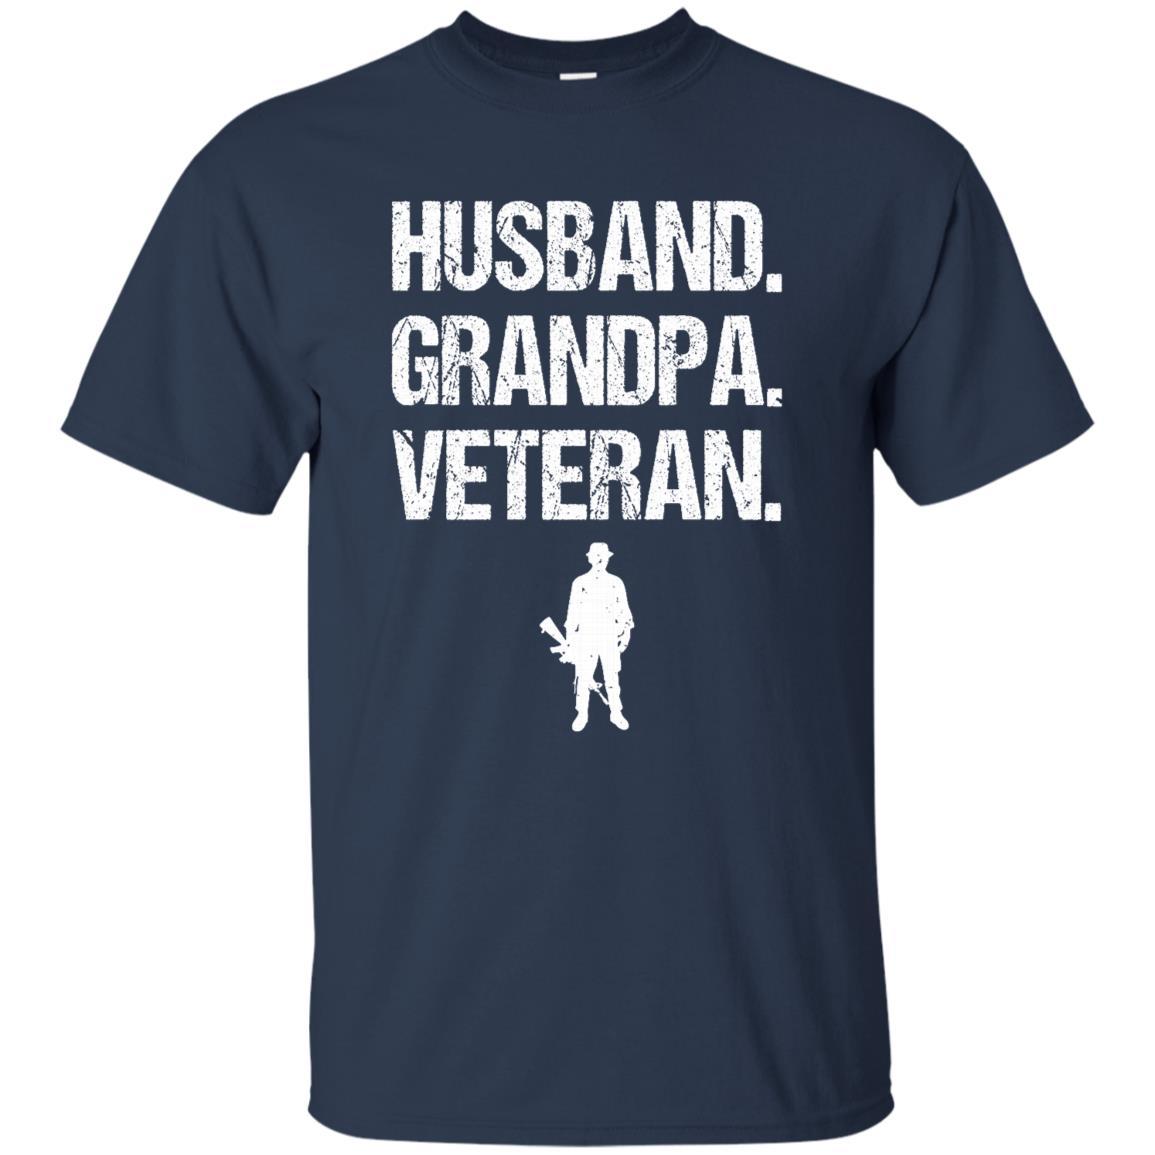 Husband Grandpa Veteran Patriotic Military Unisex Short Sleeve